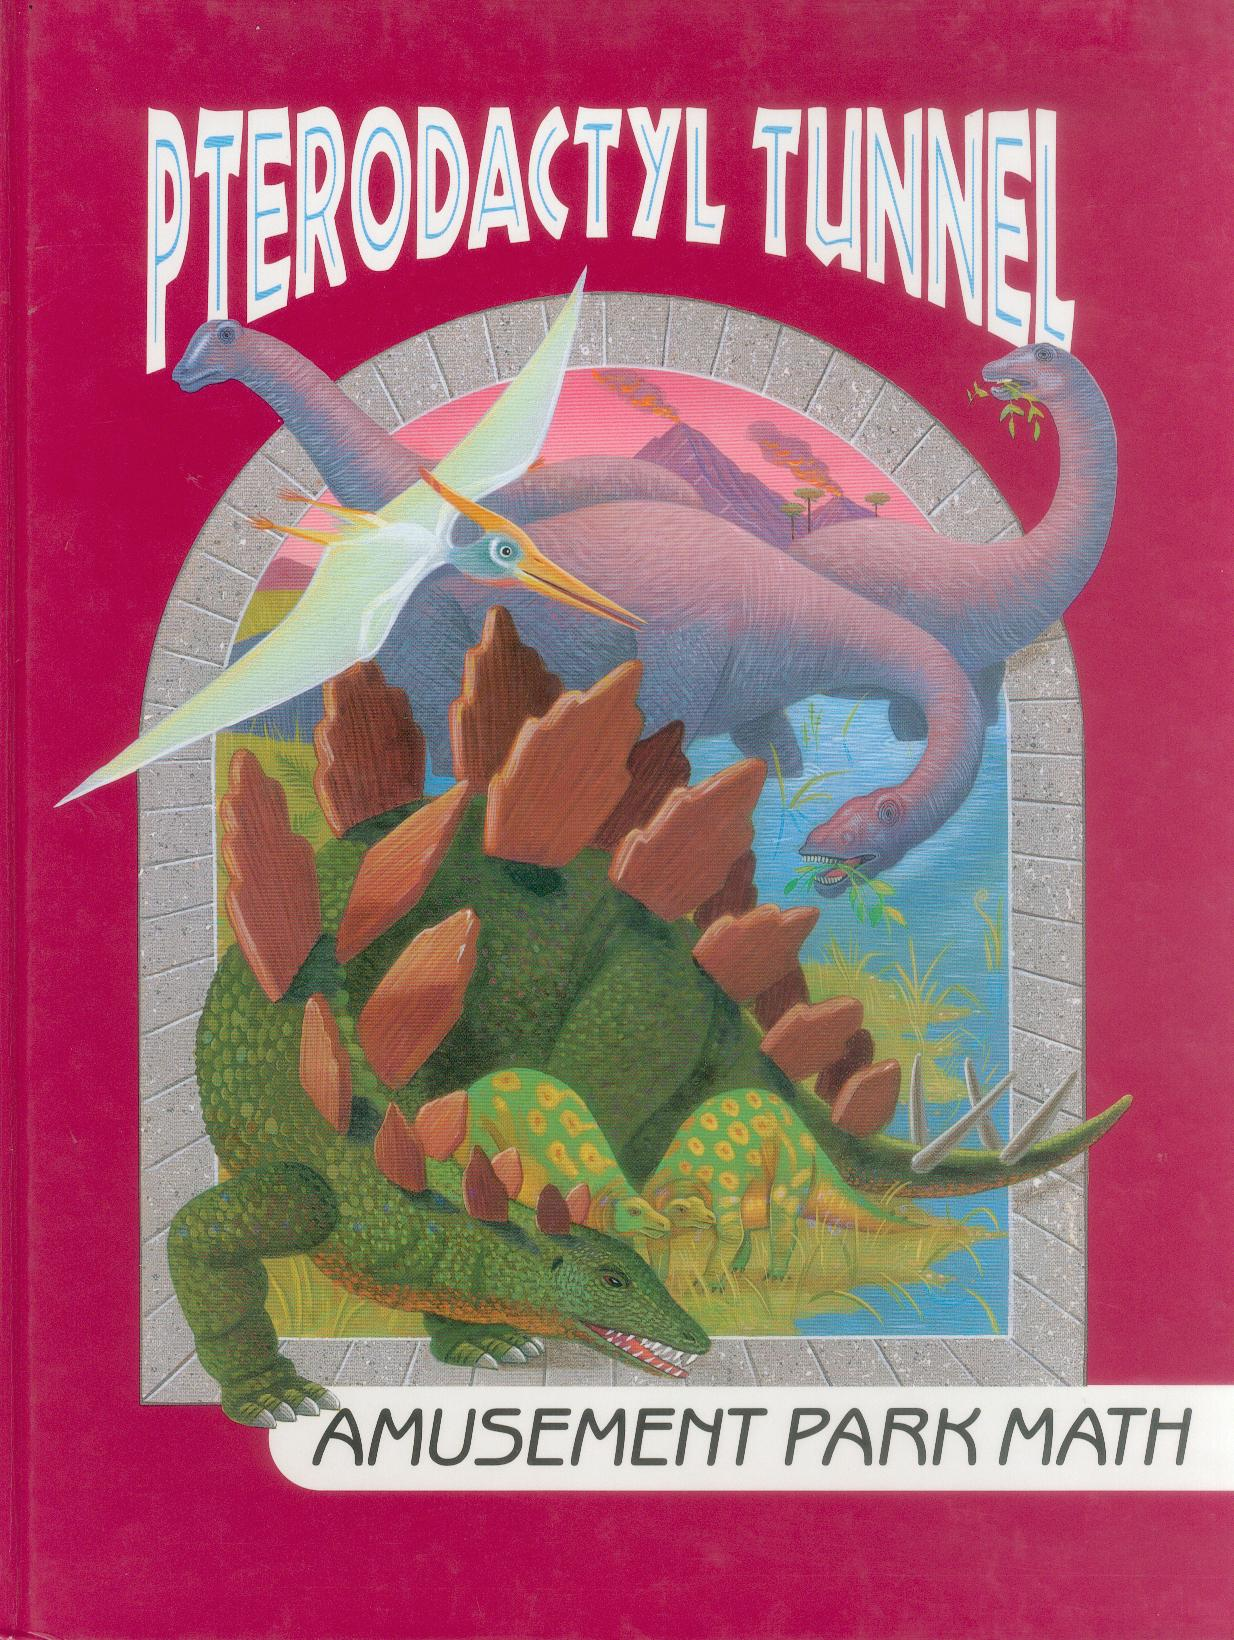 AmusementParkMath.jpg